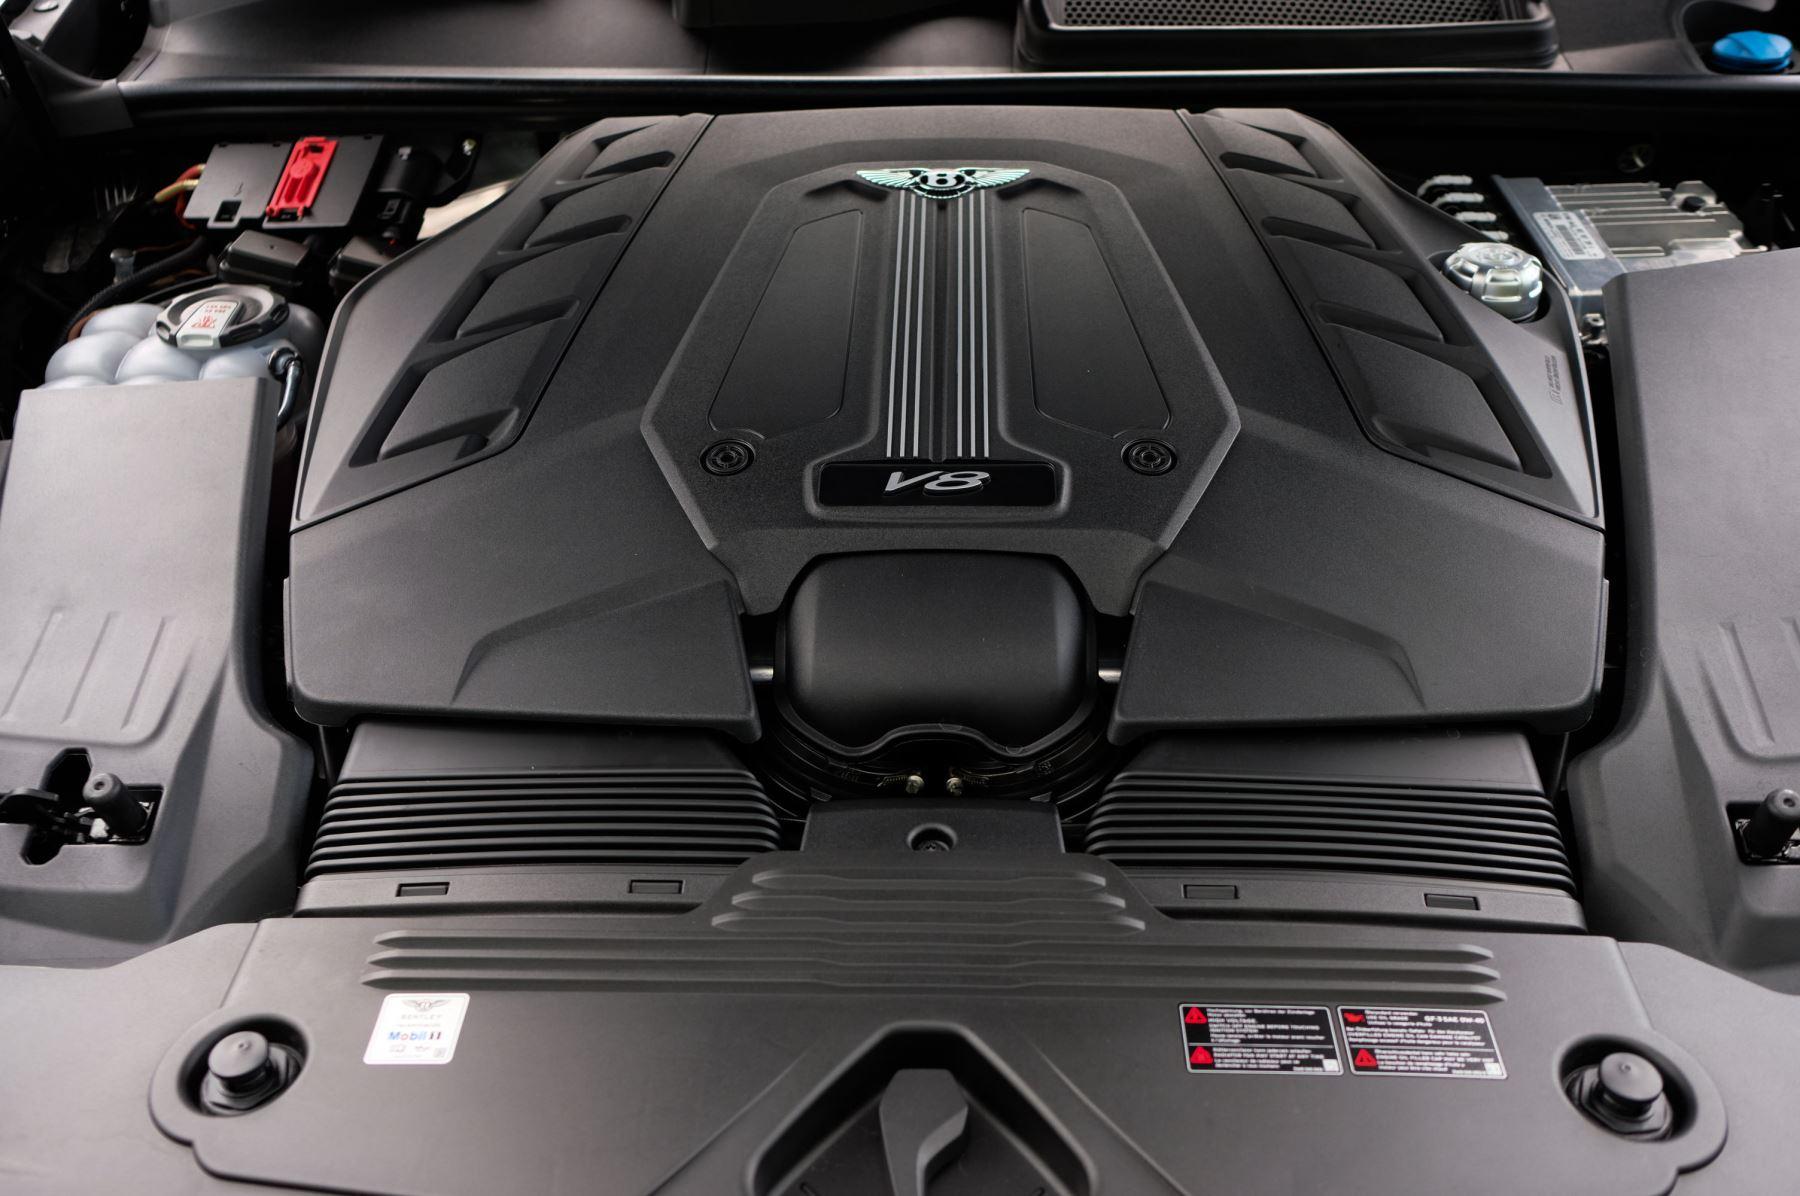 Bentley Bentayga 4.0 V8 - Mulliner Driving Specification for Black Specification image 9